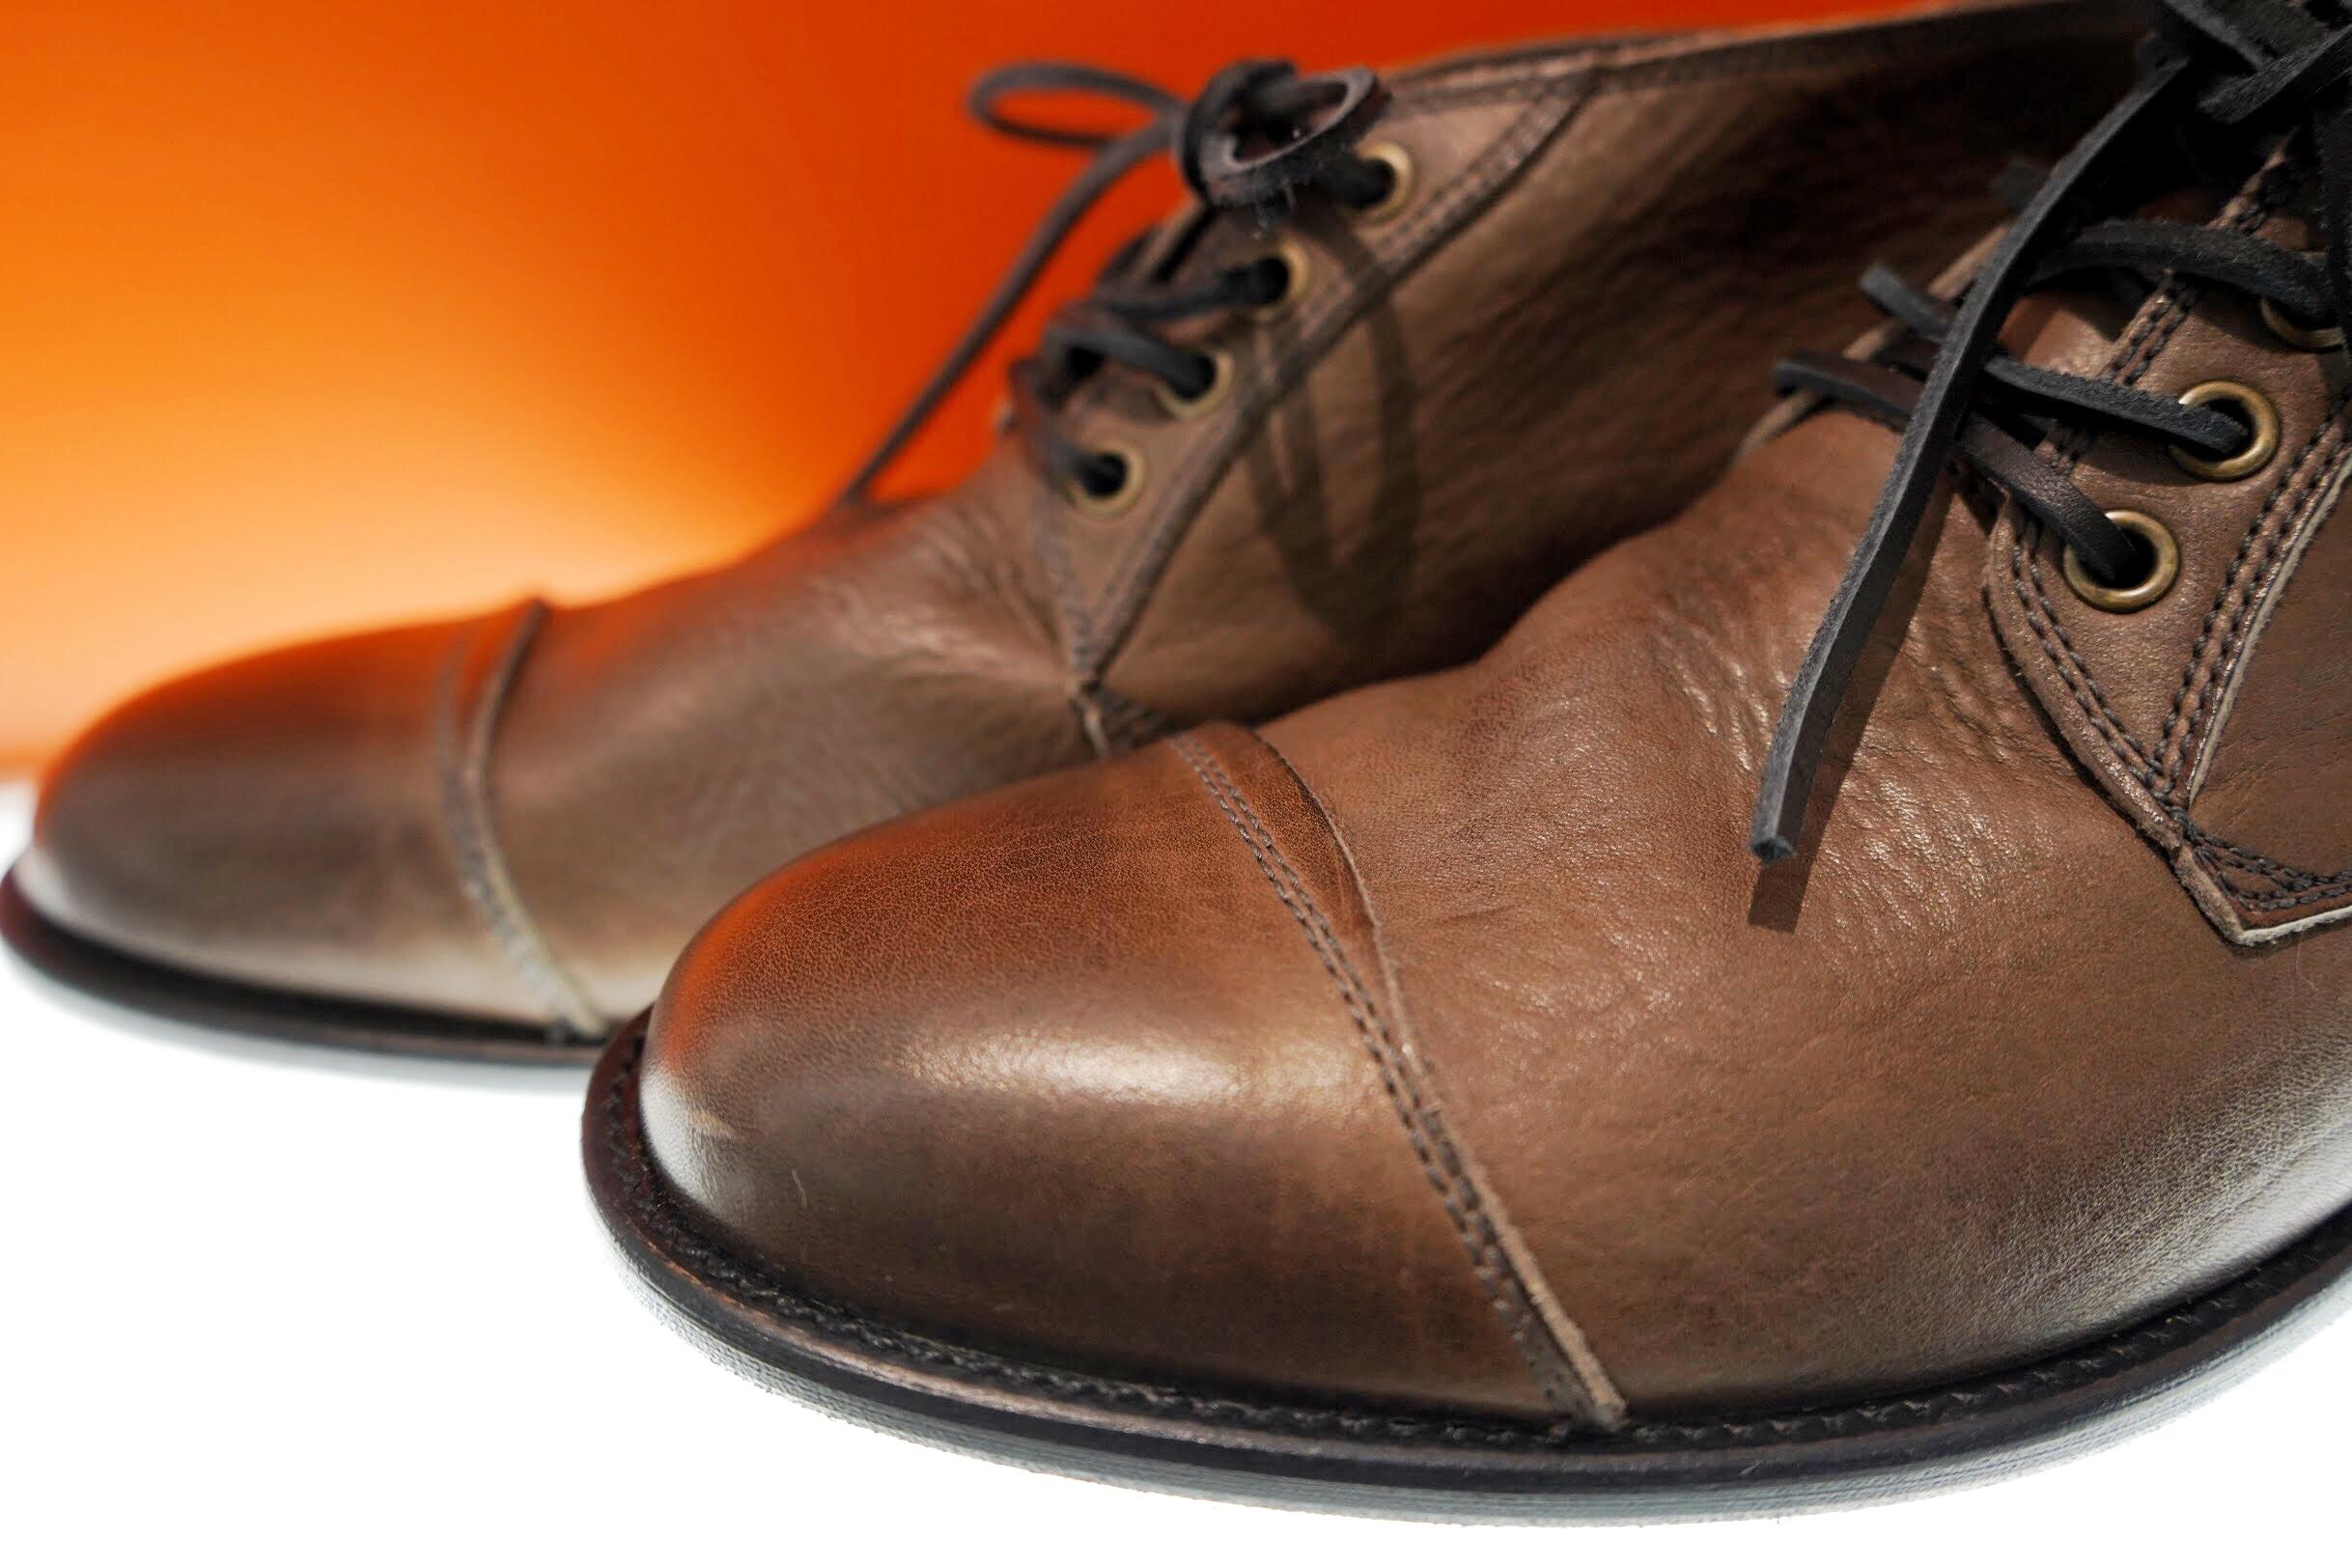 ARGIS日本製皮鞋